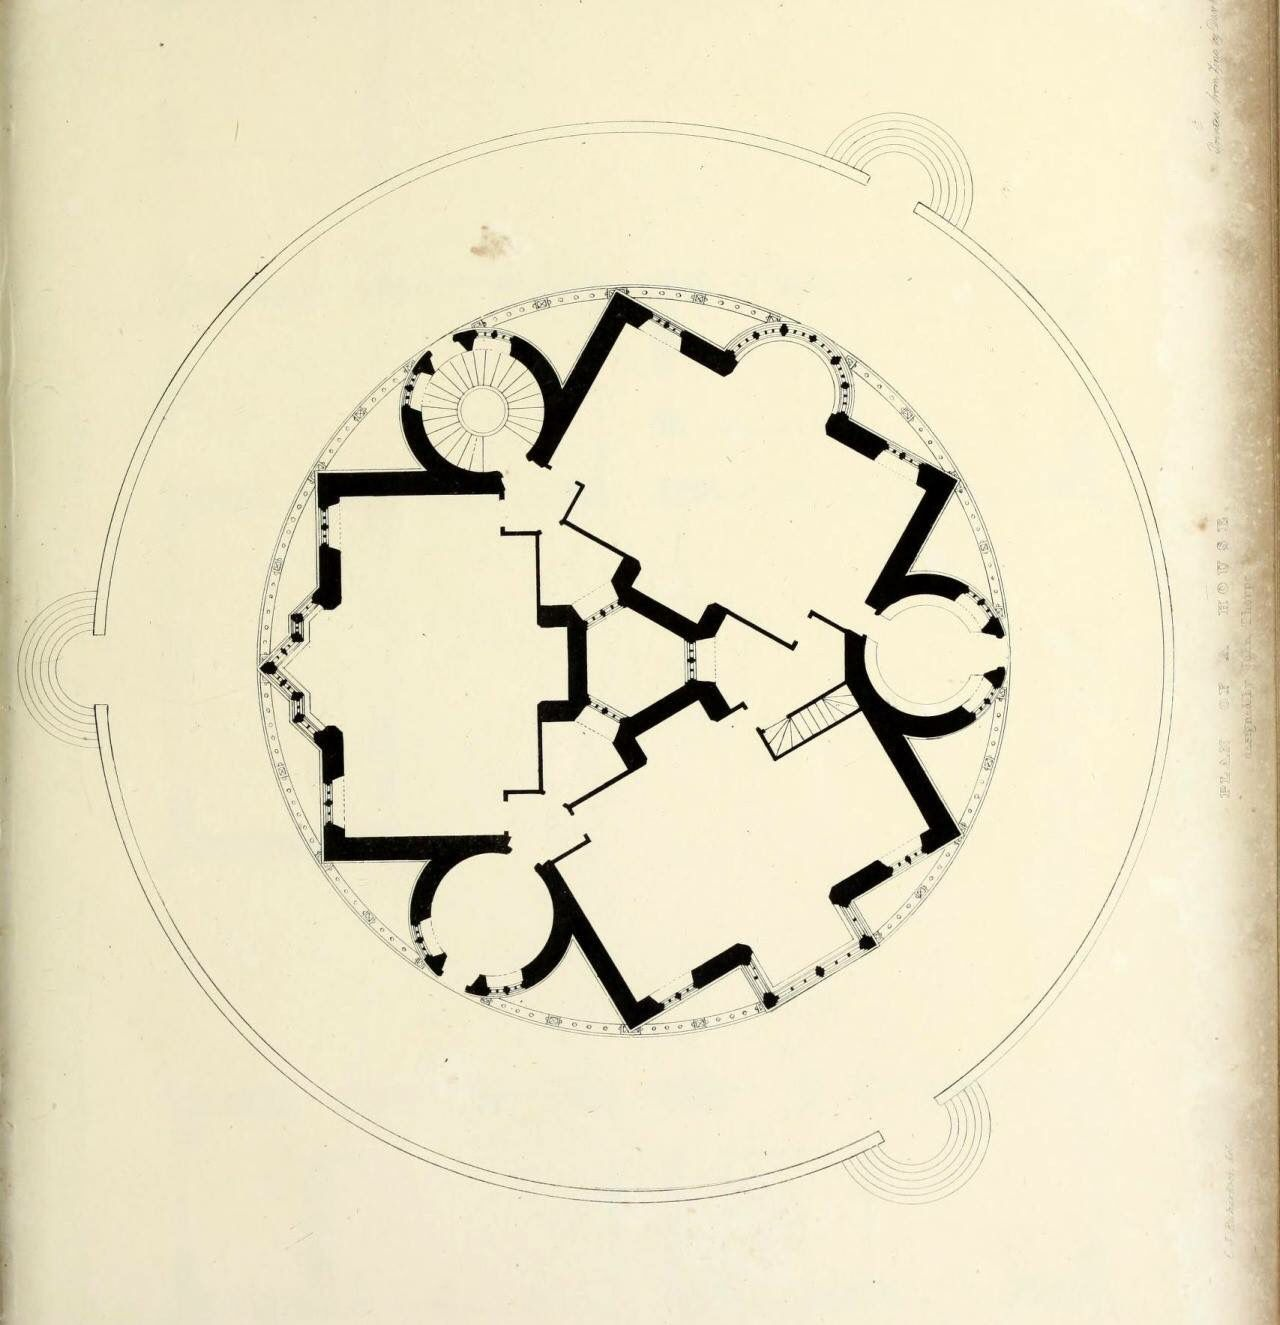 Circular house design by John Thorpe